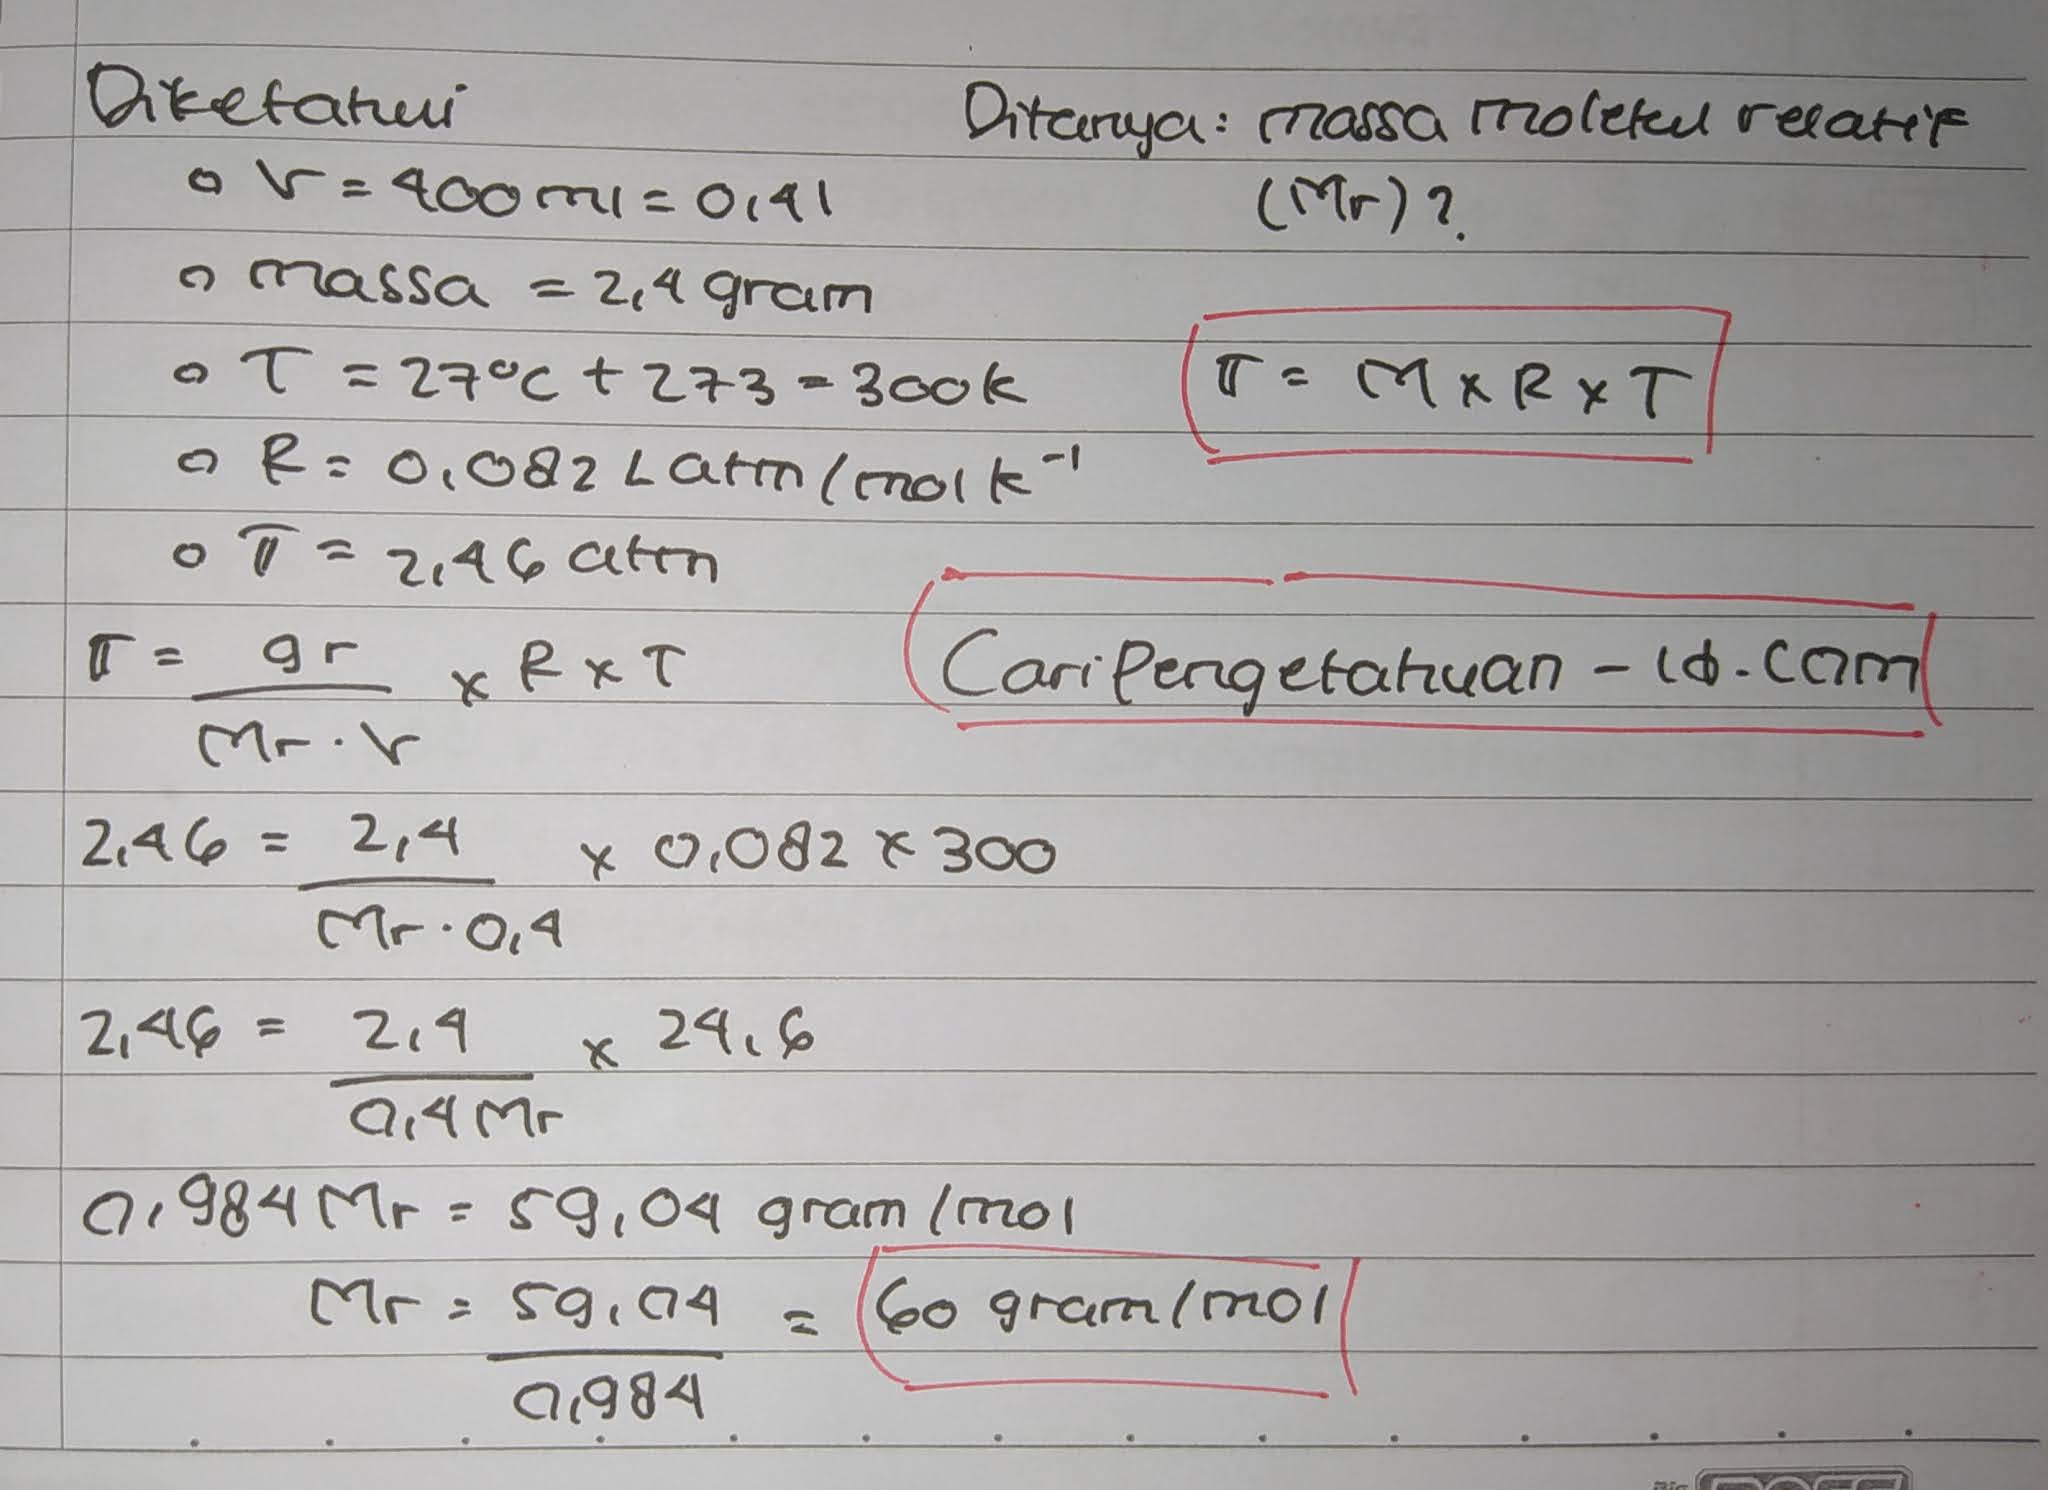 Dalam 400 mL larutan terdapat 2,4 gram zat nonelektrolit. Jika pada suhu 27°C, tekanan osmosis larutan 2,46 atm, massa molekul relatif (Mr) zat tersebut adalah